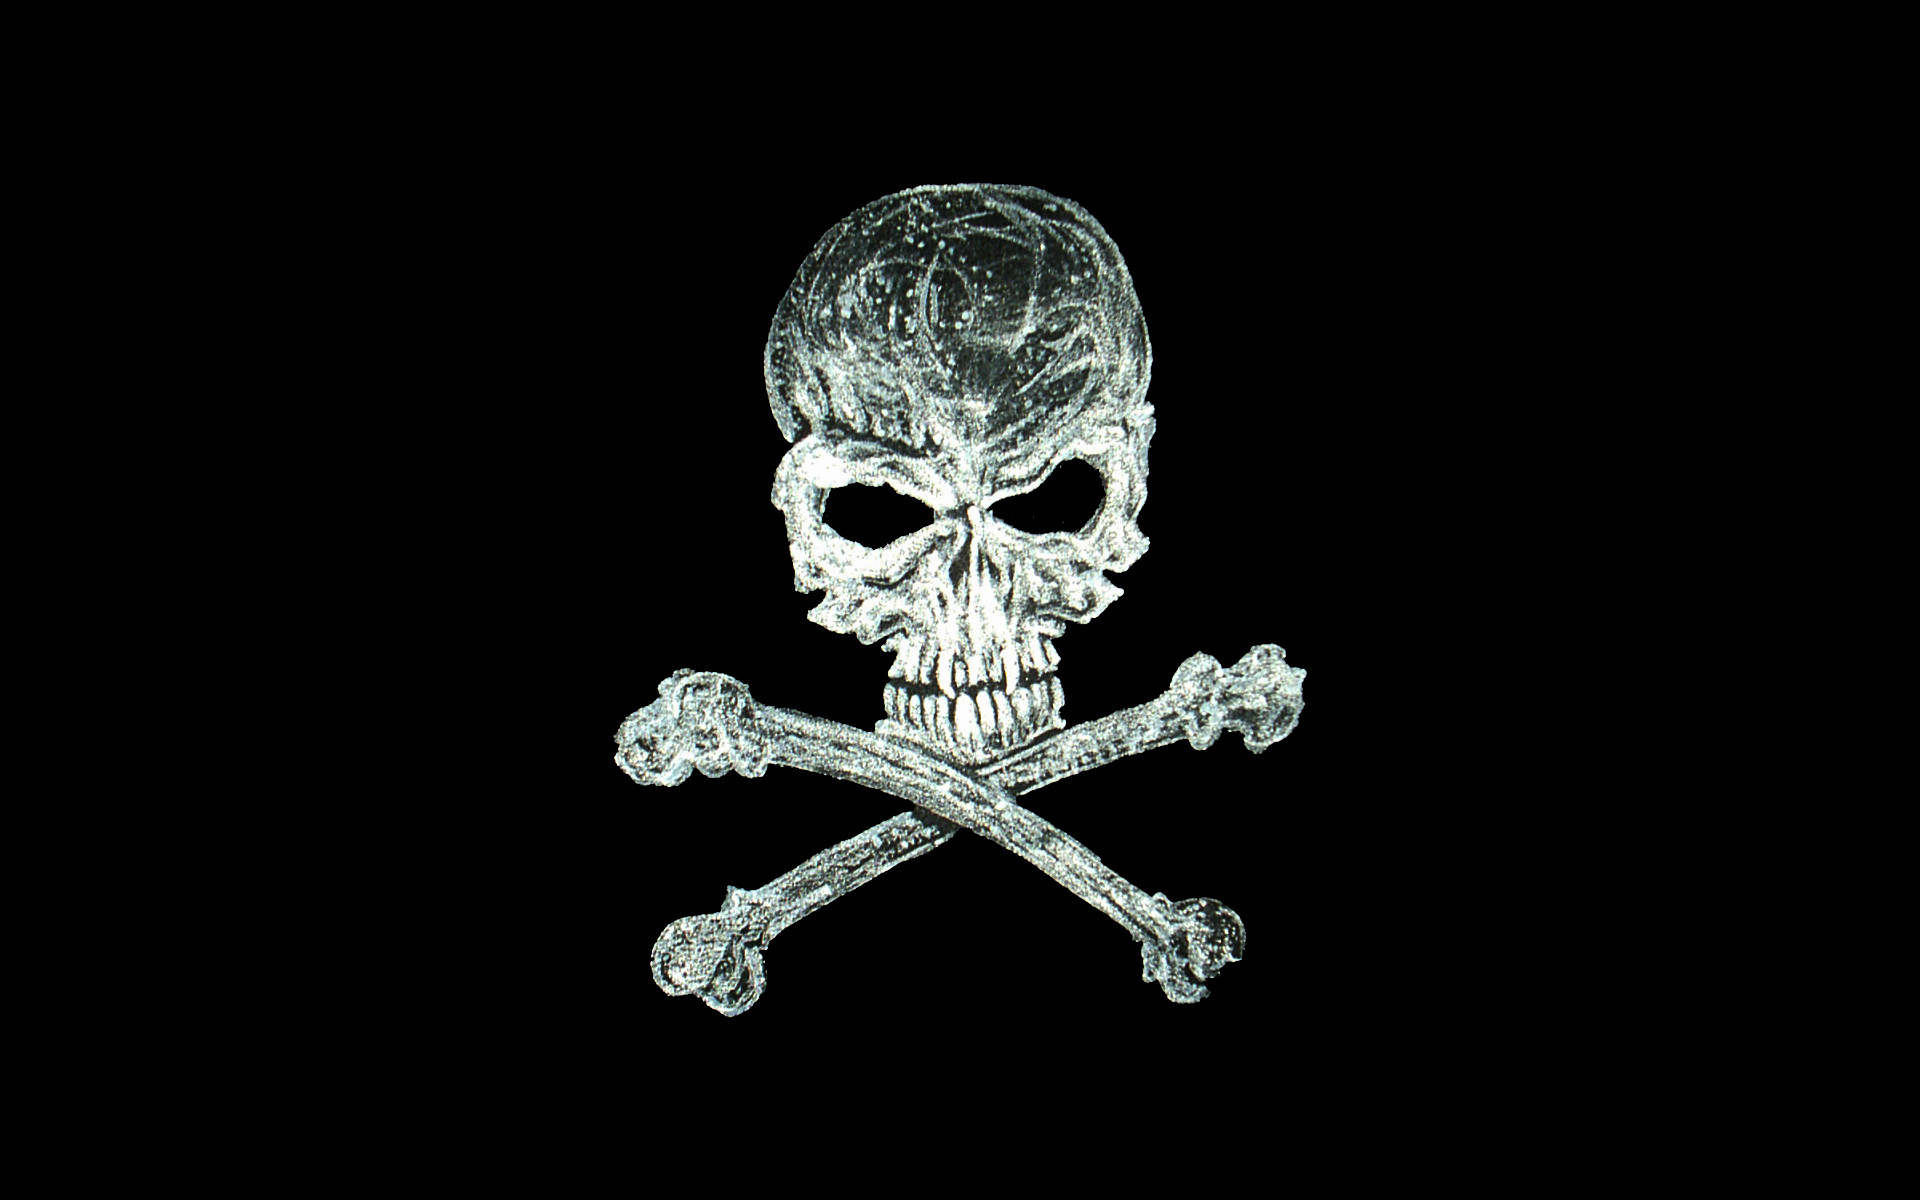 Free D Skull Wallpapers Wallpaper 1920×1080 Cool HD Skull Wallpapers (47  Wallpapers) | Adorable Wallpapers | Desktop | Pinterest | Hd skull  wallpapers, …